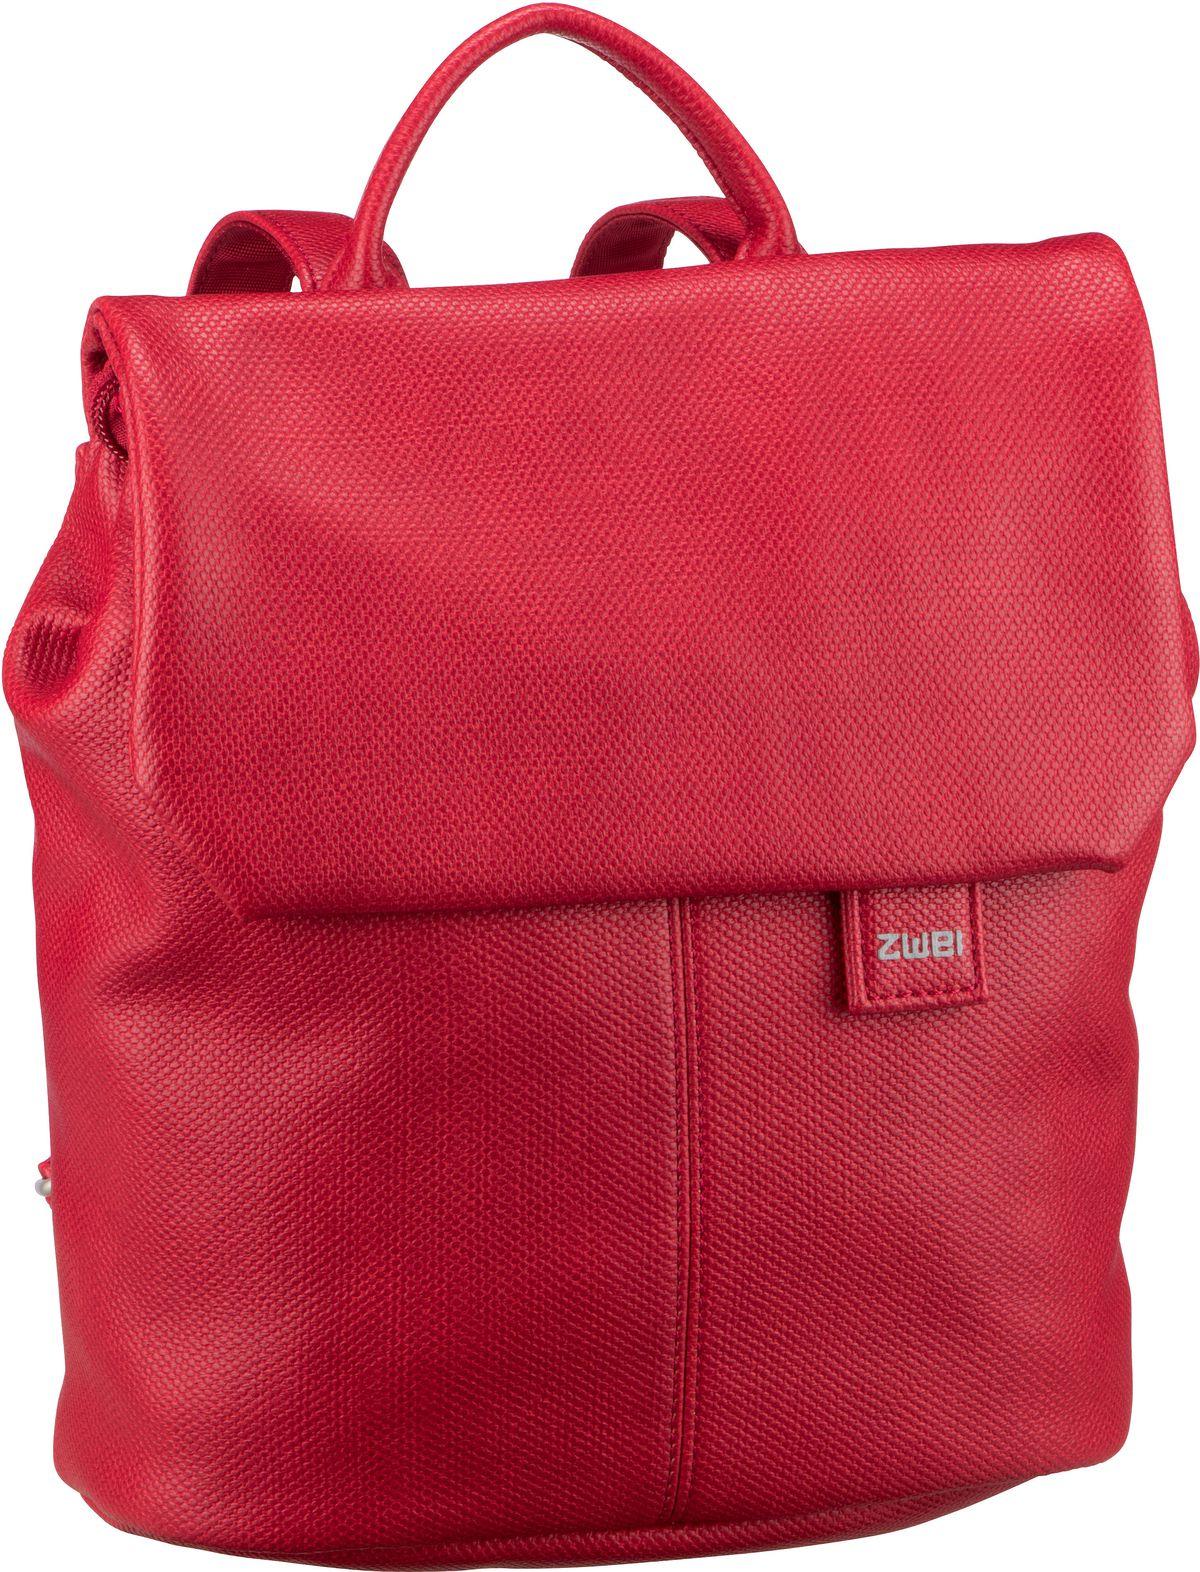 Rucksack / Daypack Mademoiselle MR8 Canvas/Red (4 Liter)